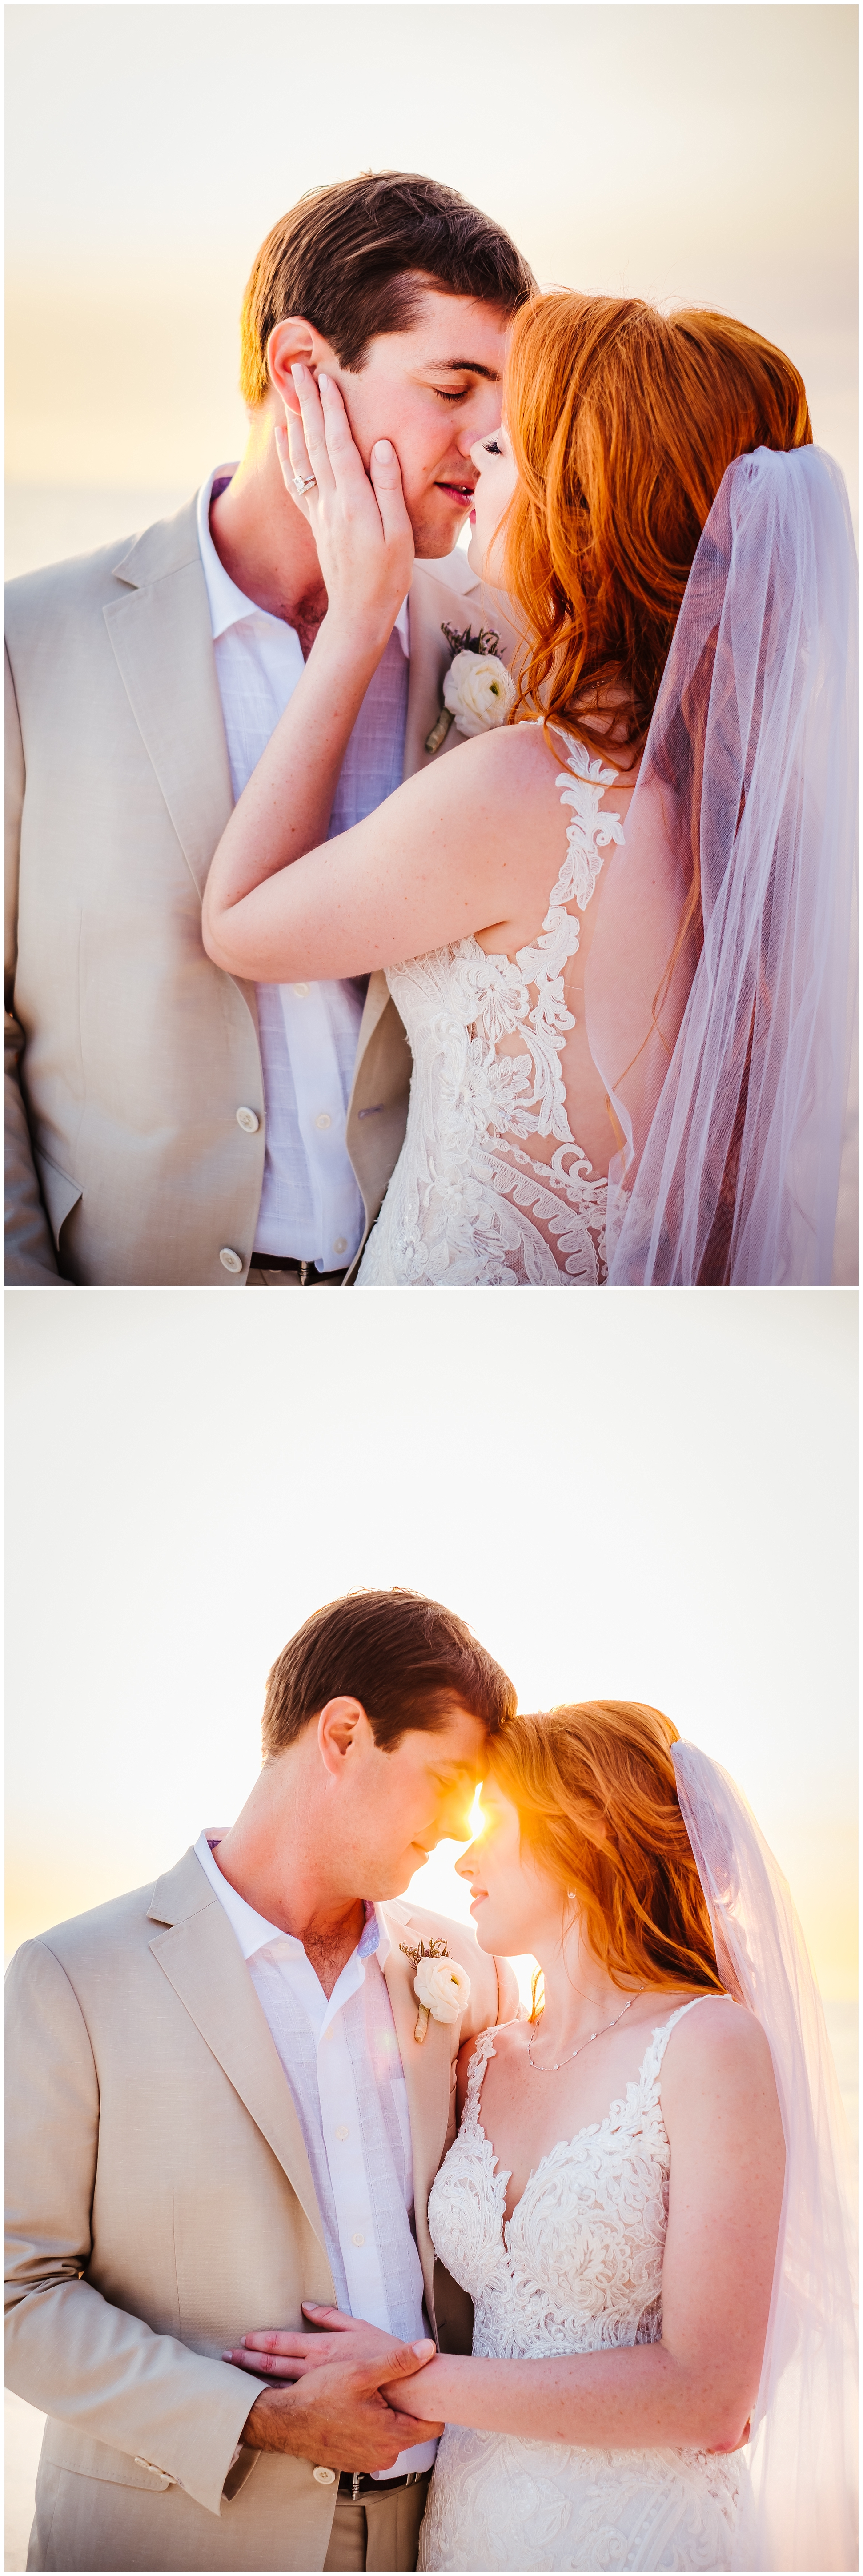 tampa-st-pete-wedding-photographer-indian-rocks-beach-mermaid-train-redhead_0161.jpg